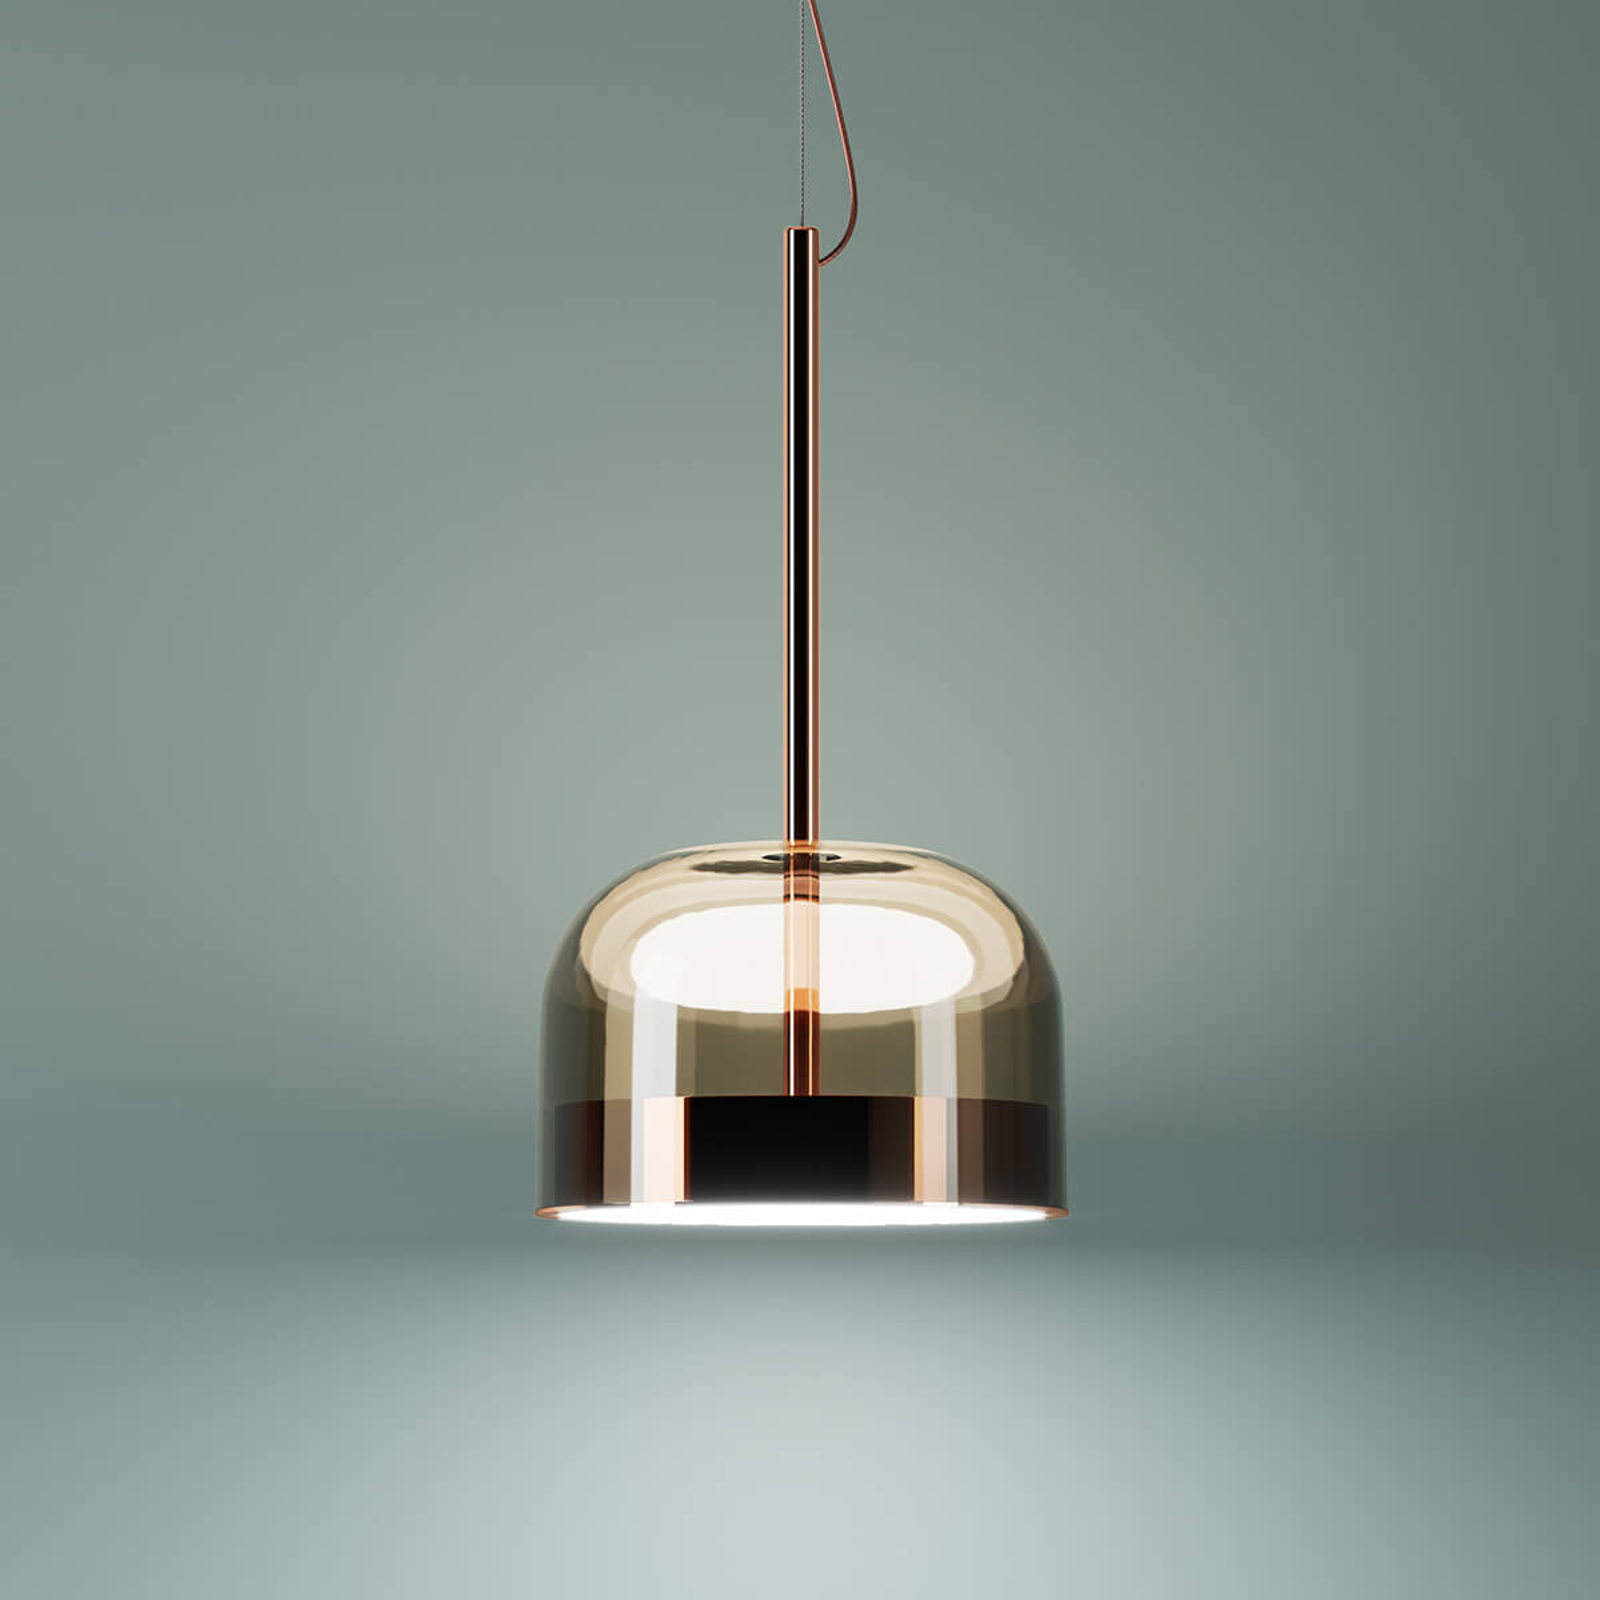 Kobberfarget LED pendellampe Equator, 23,8cm